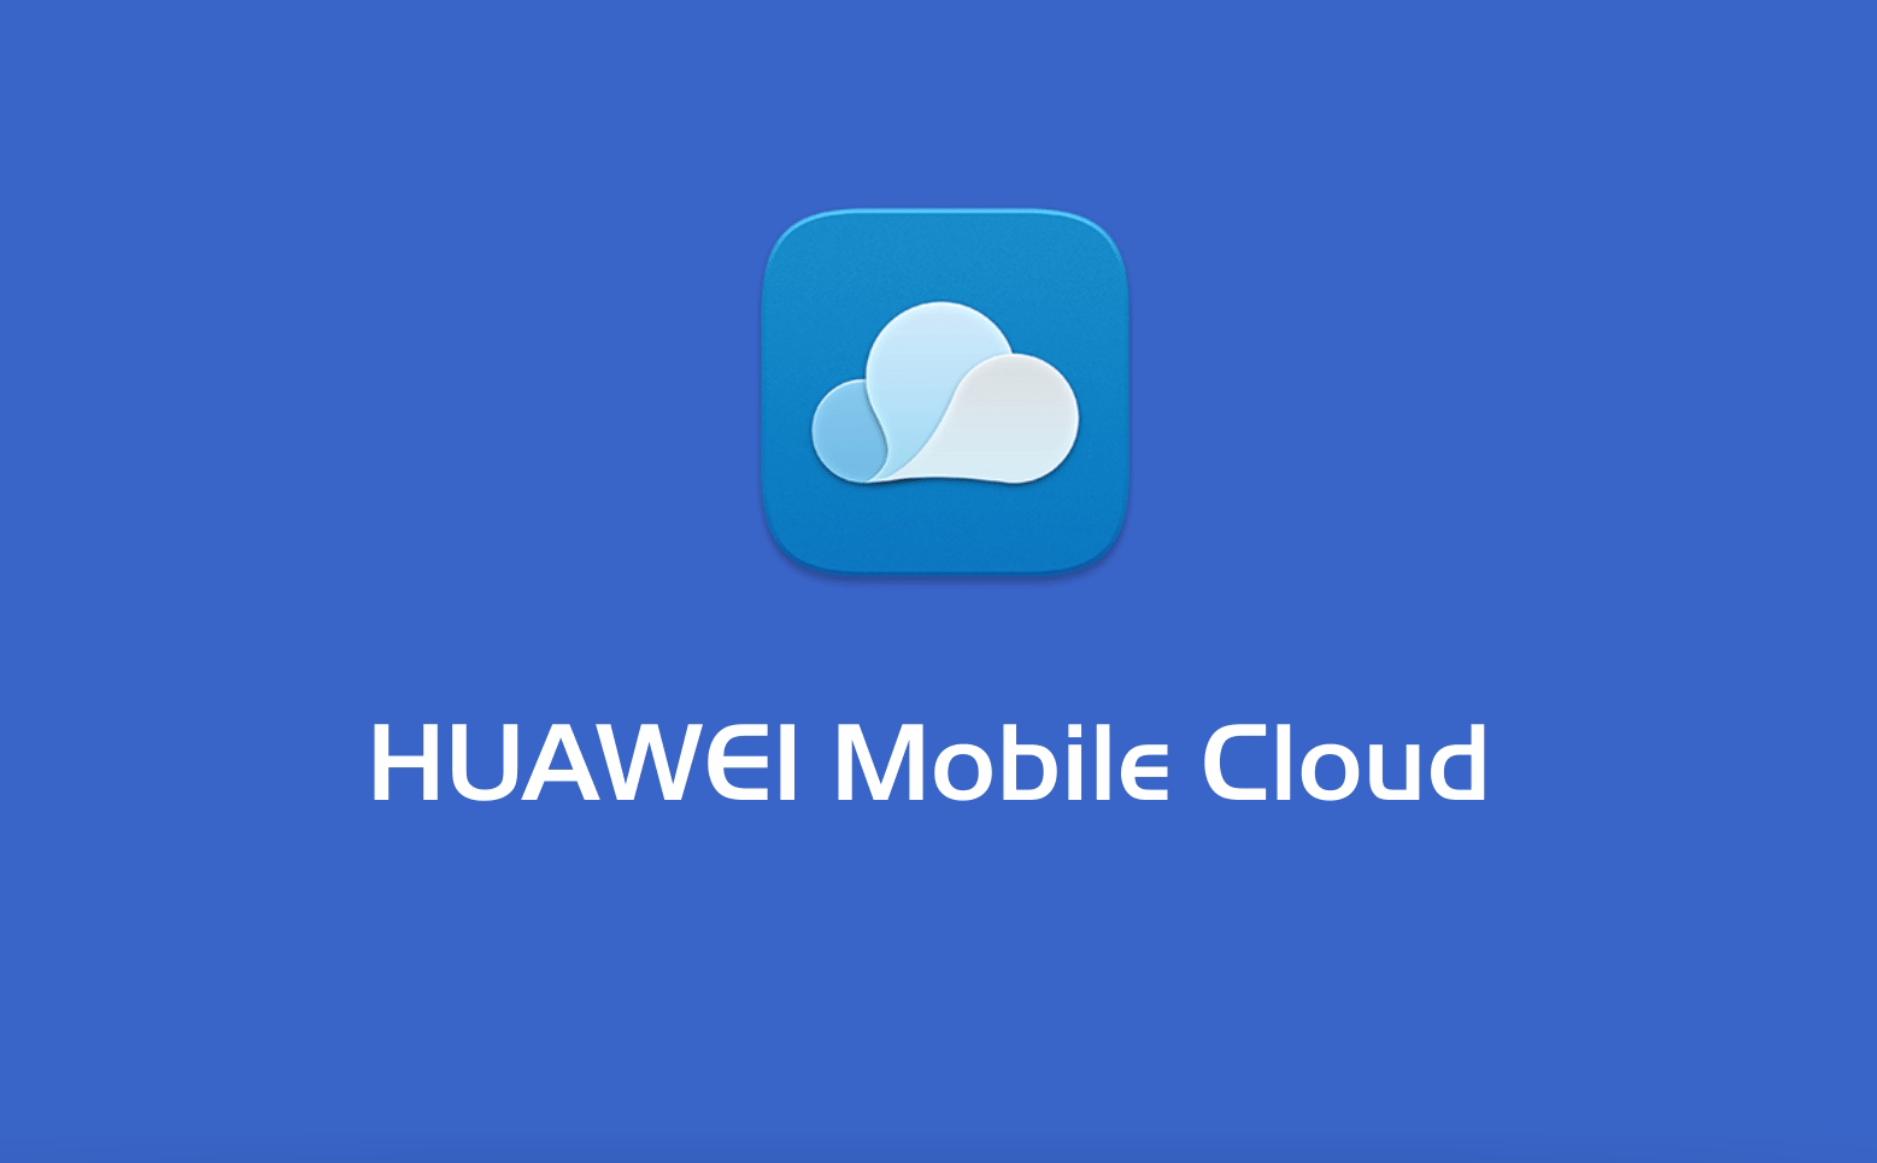 Huawei Pilvipalvelu